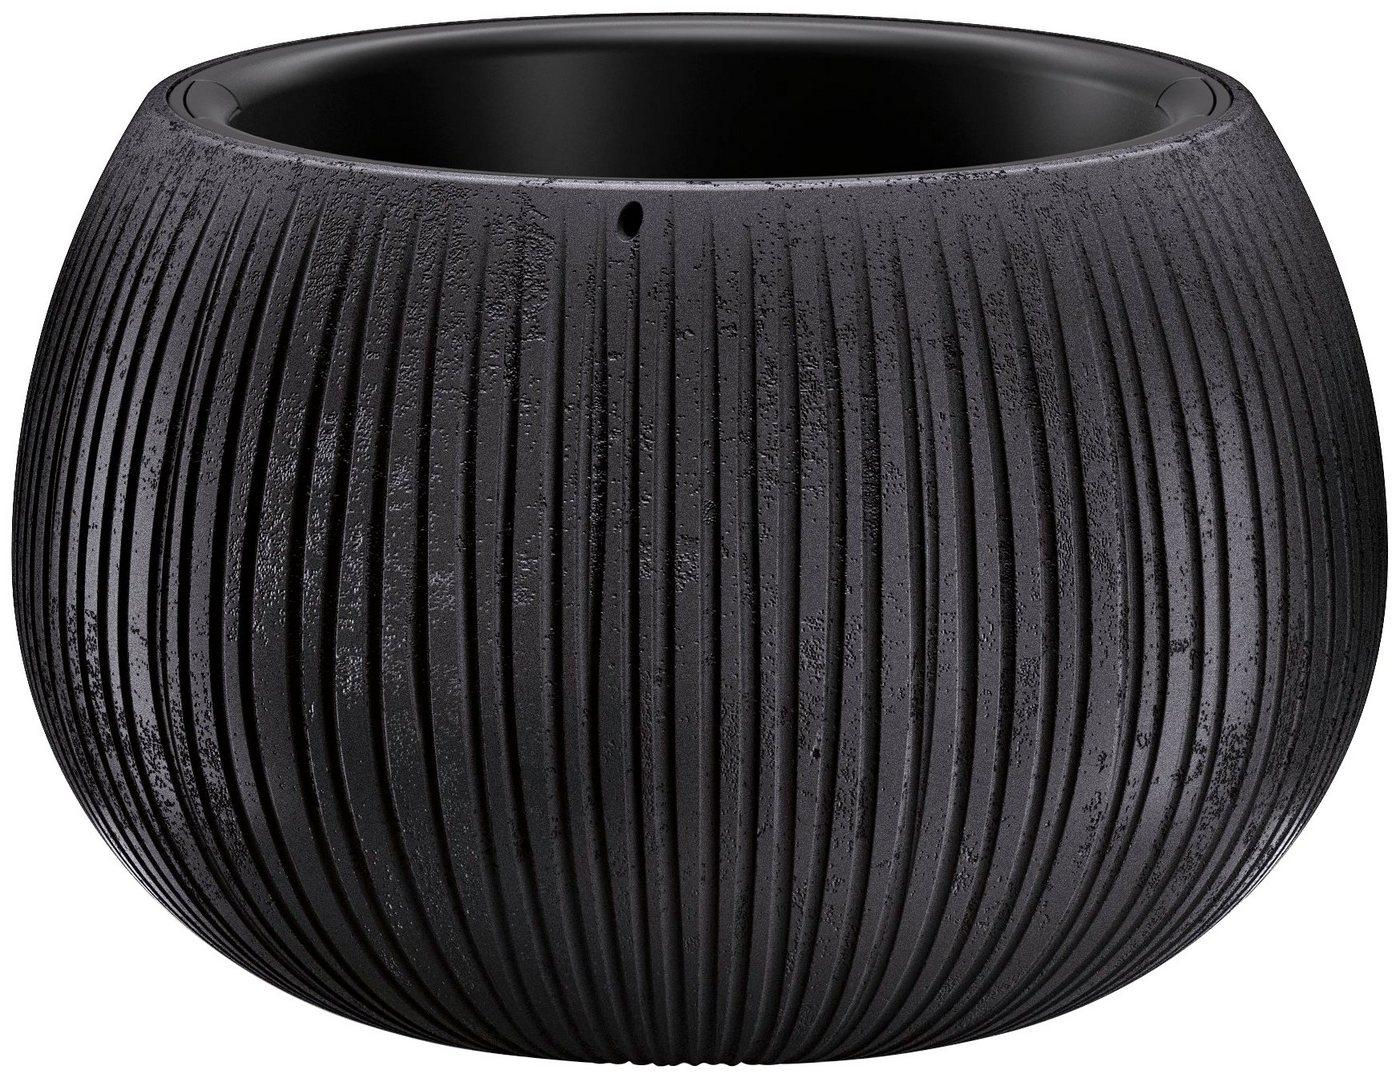 Prosperplast Blumentopf »Beton Bowl« (1 Stück), Ø29cm x 19,5cm